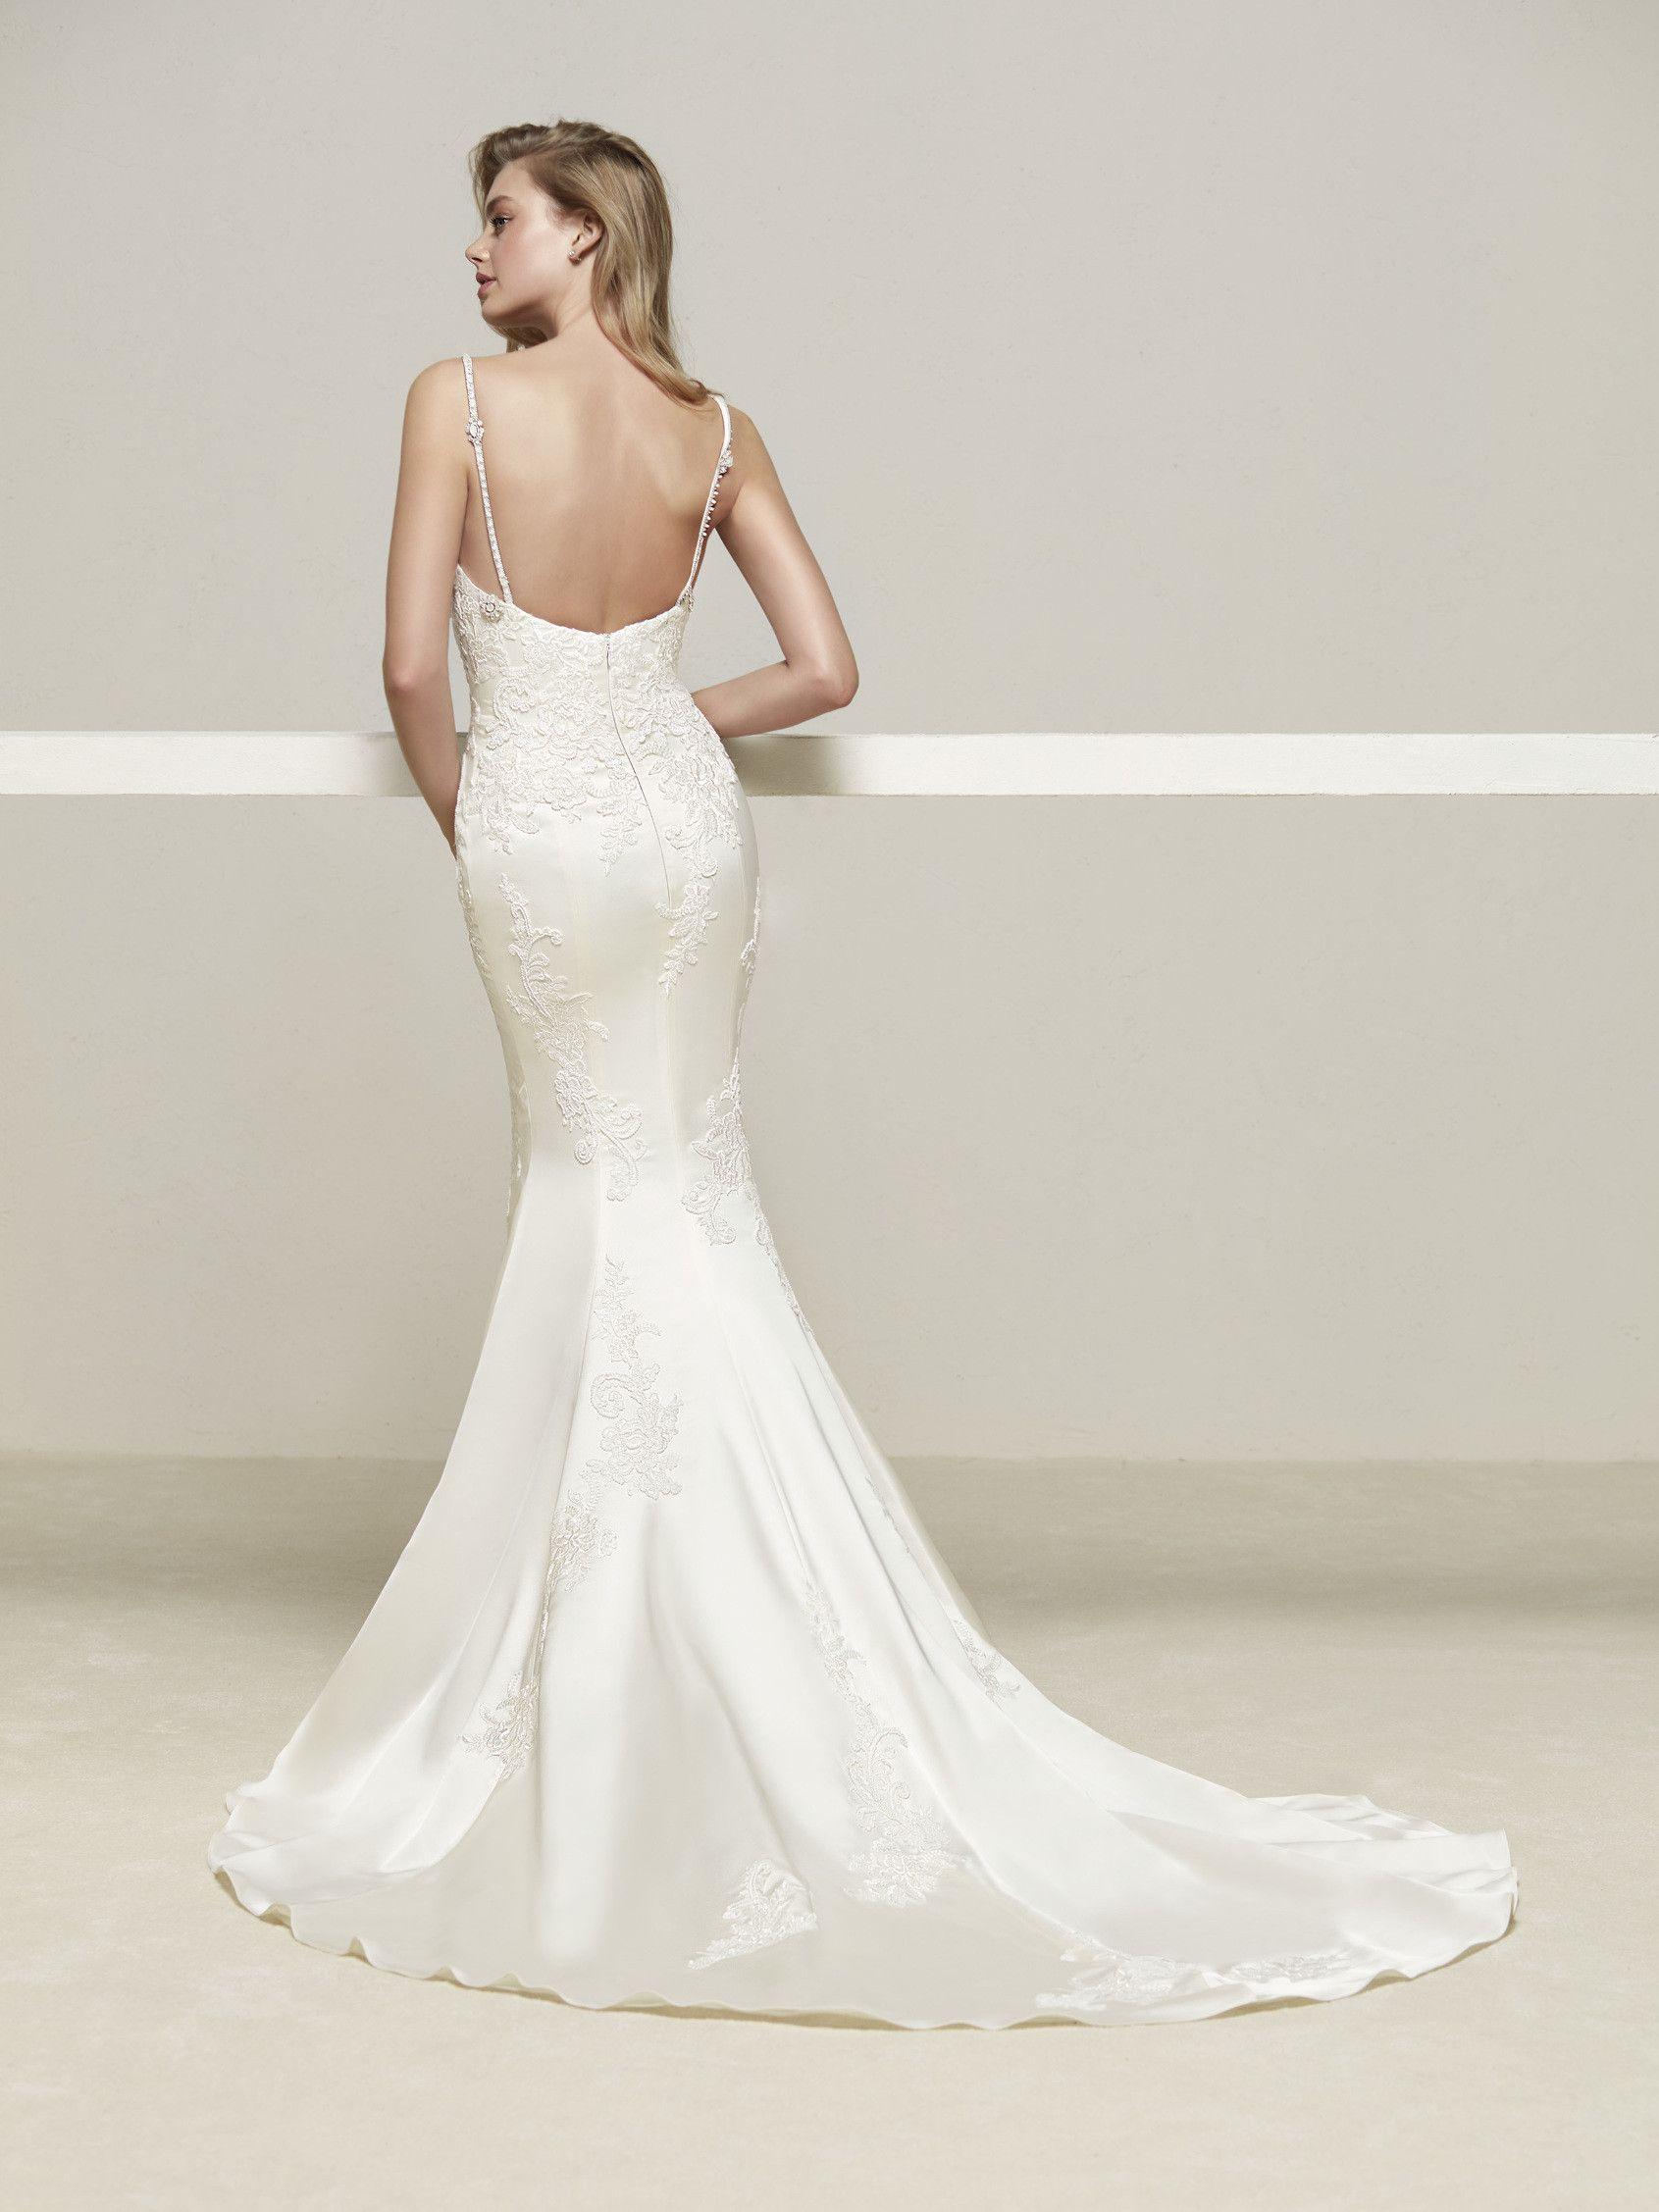 Vestido novia tirantes finos